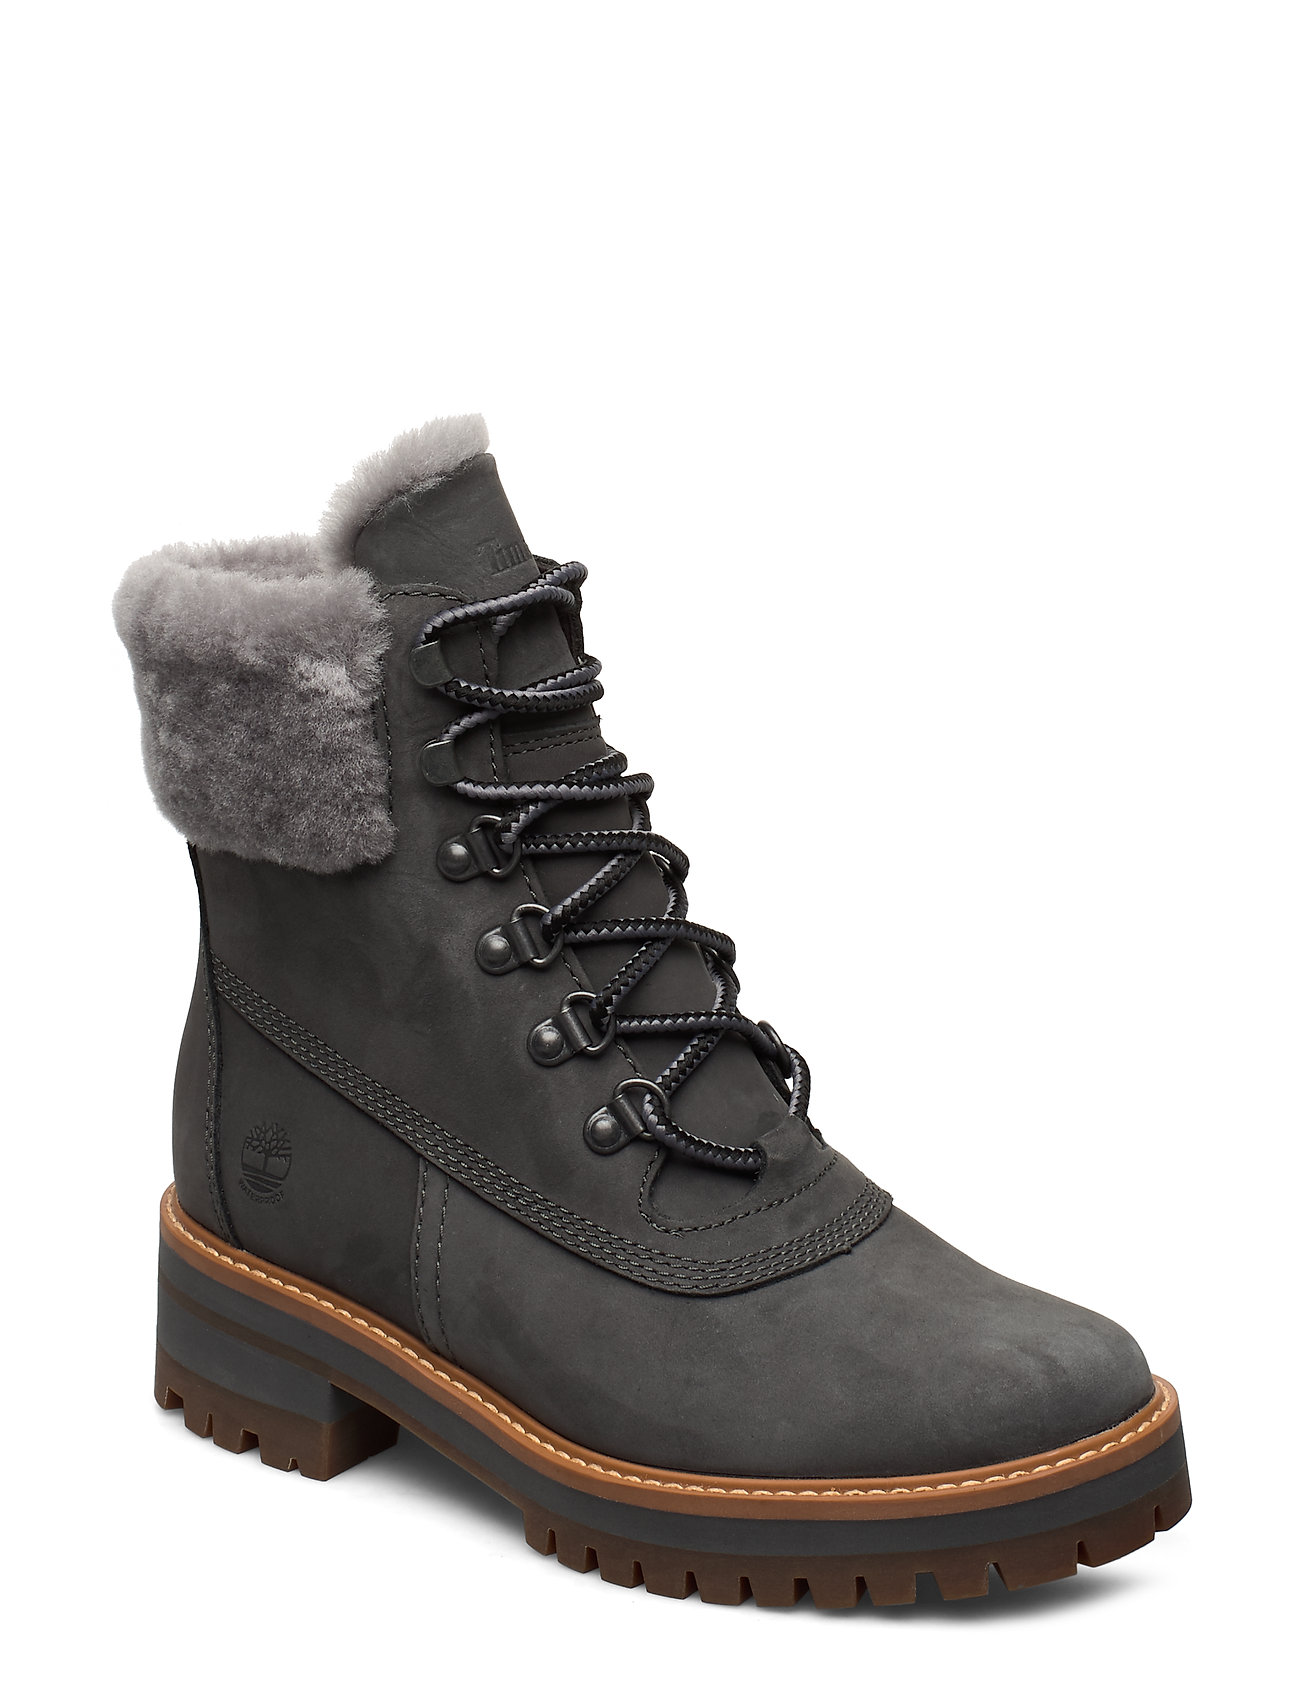 Paras hinta Timberland Courmayeur Valley Chelsea Boots